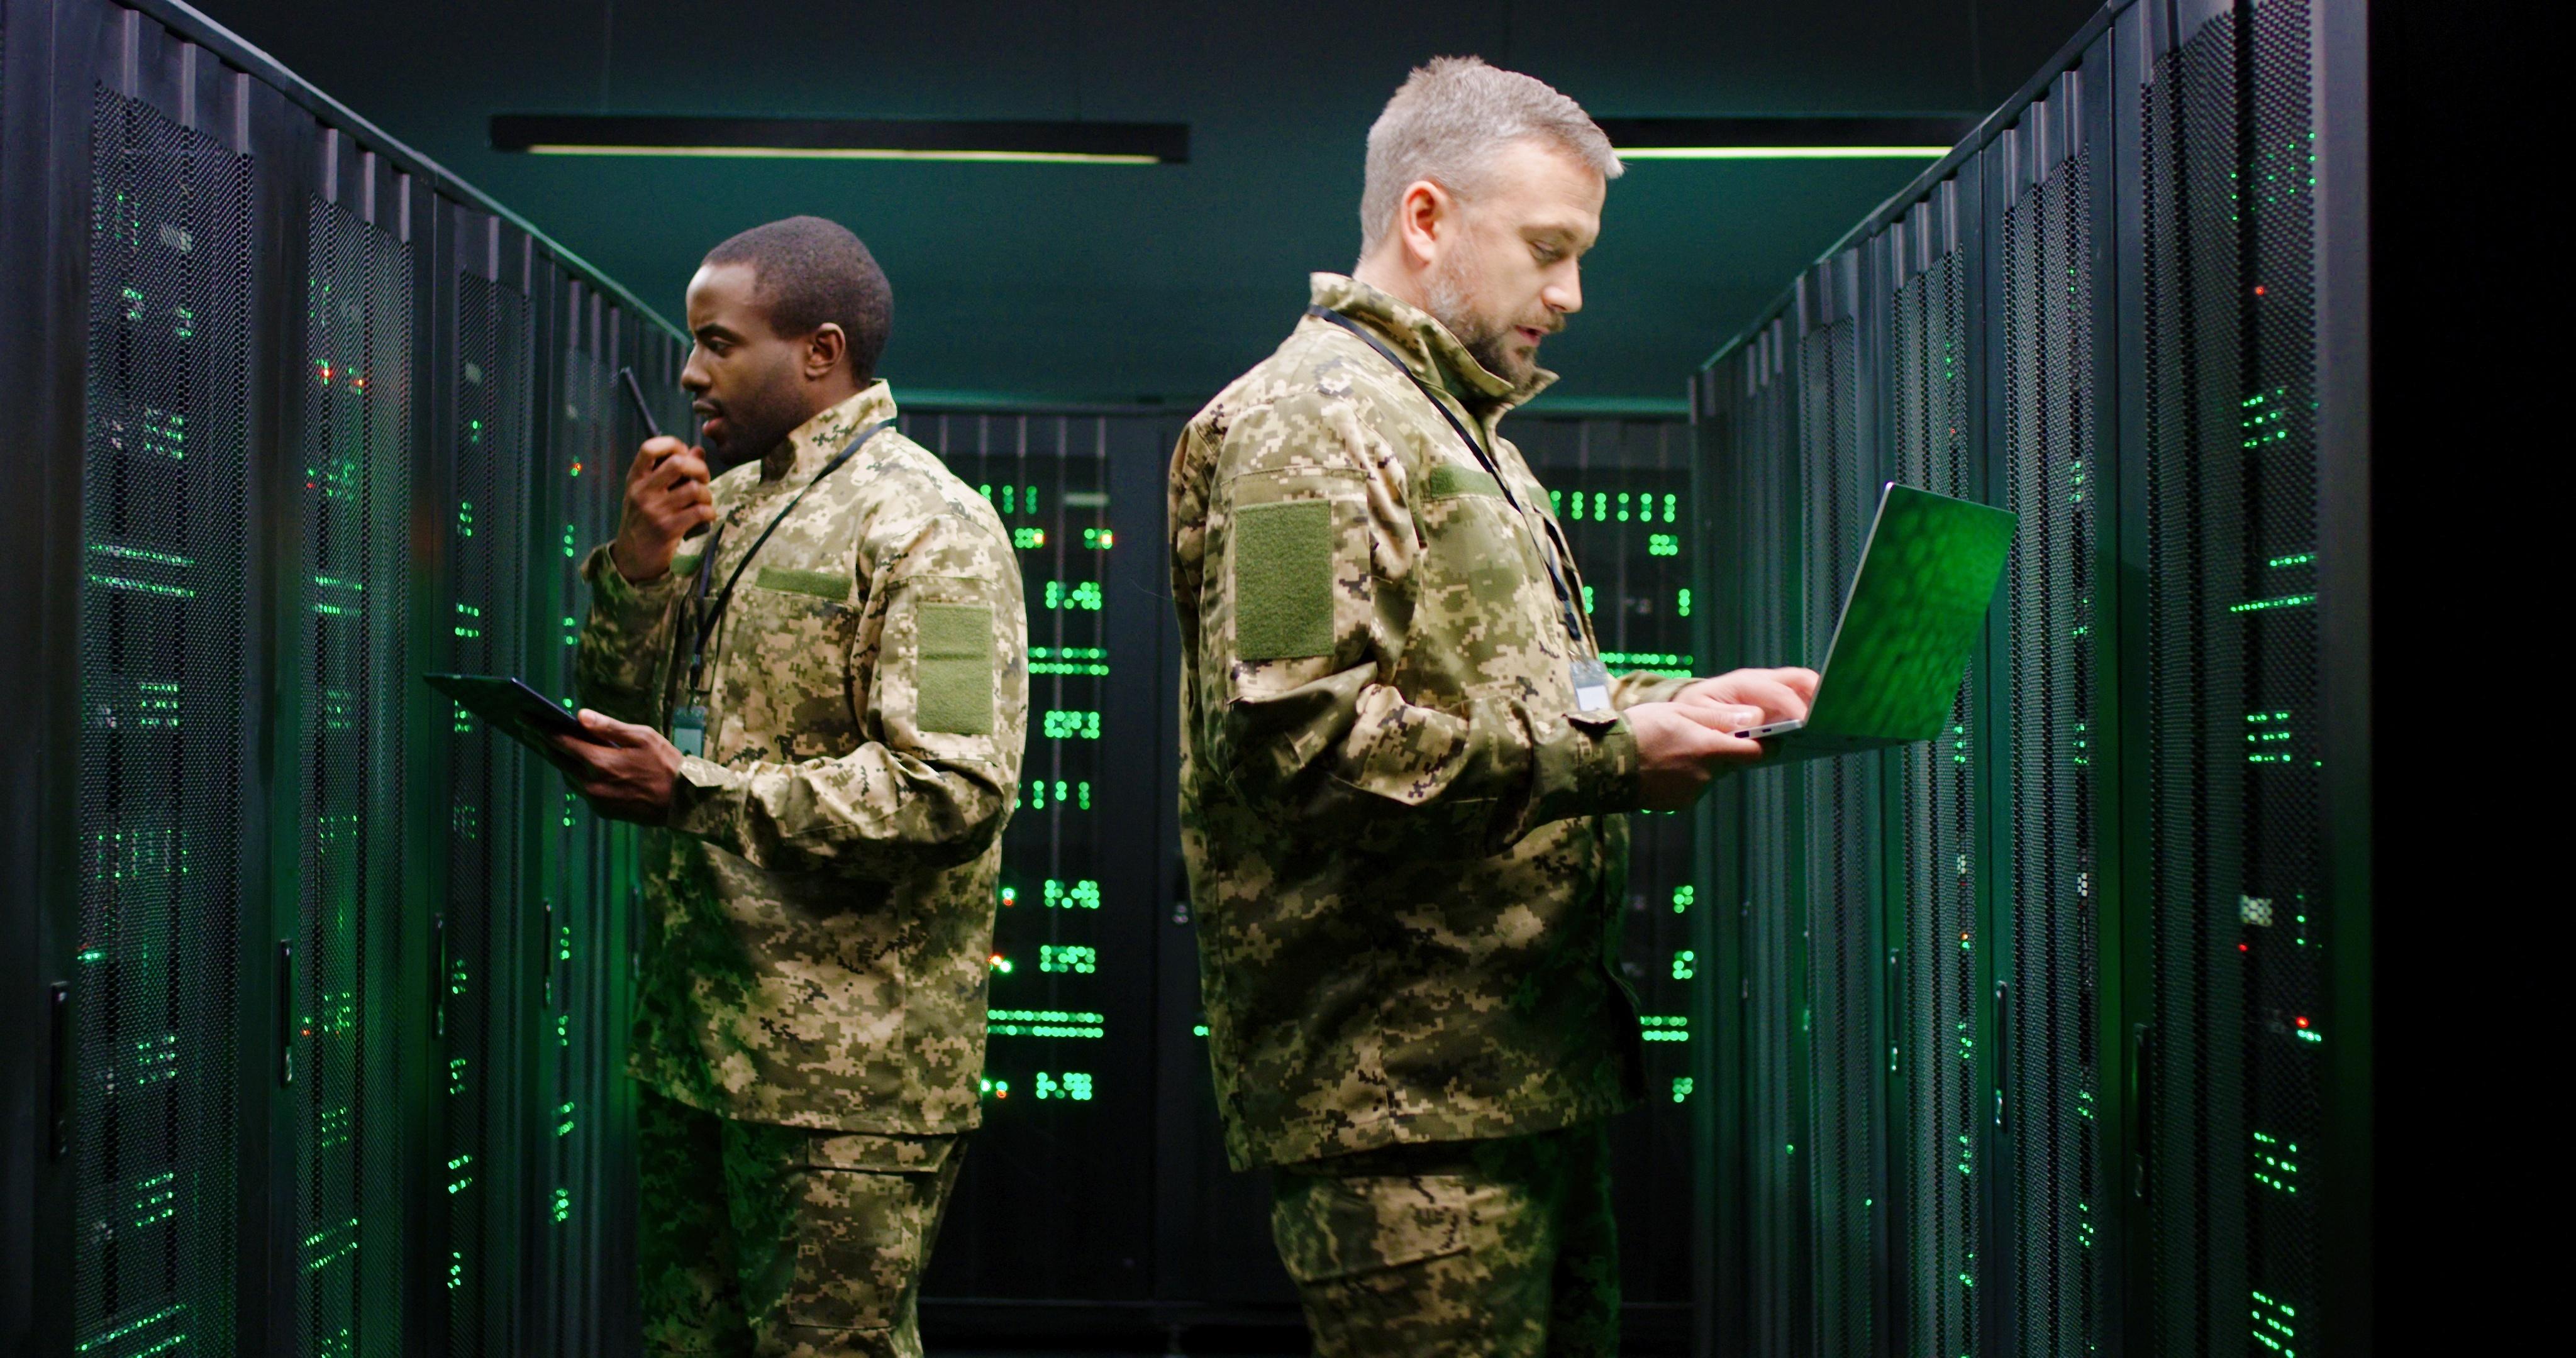 Cybersecurity Maturity Model Certification: The CMMC Basics